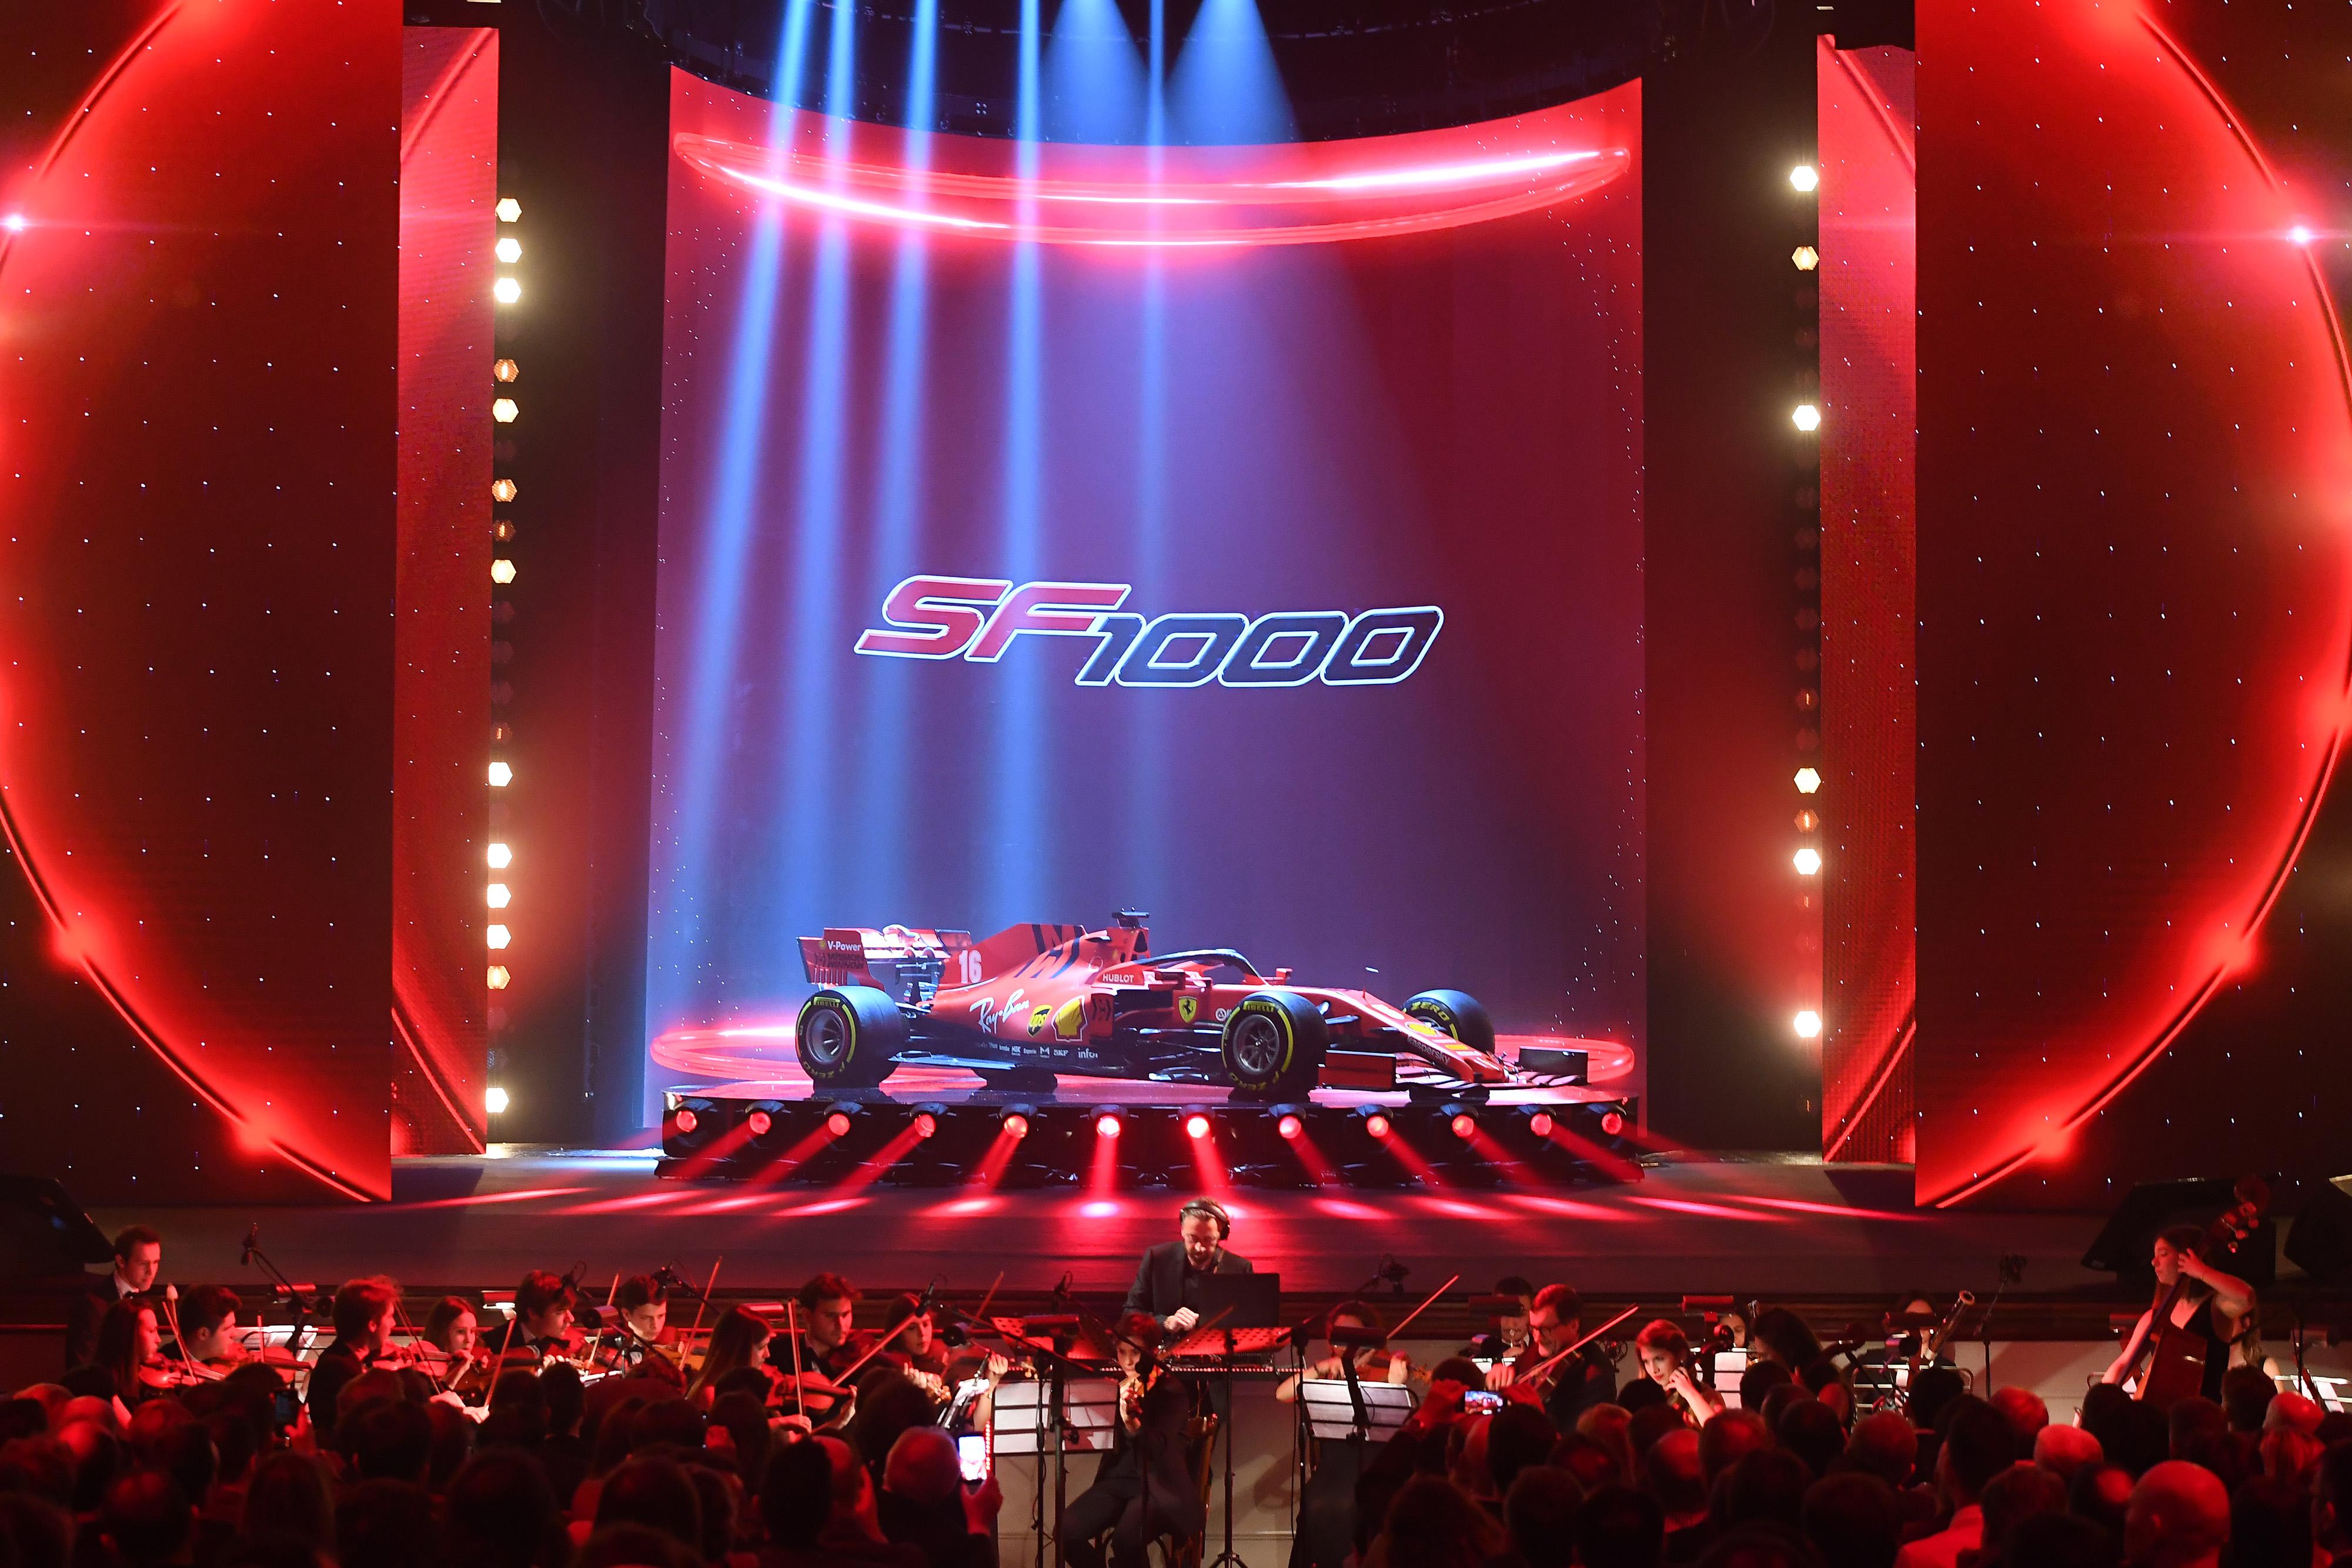 F1 Formula 1 Ferrari Binotto 2020 car